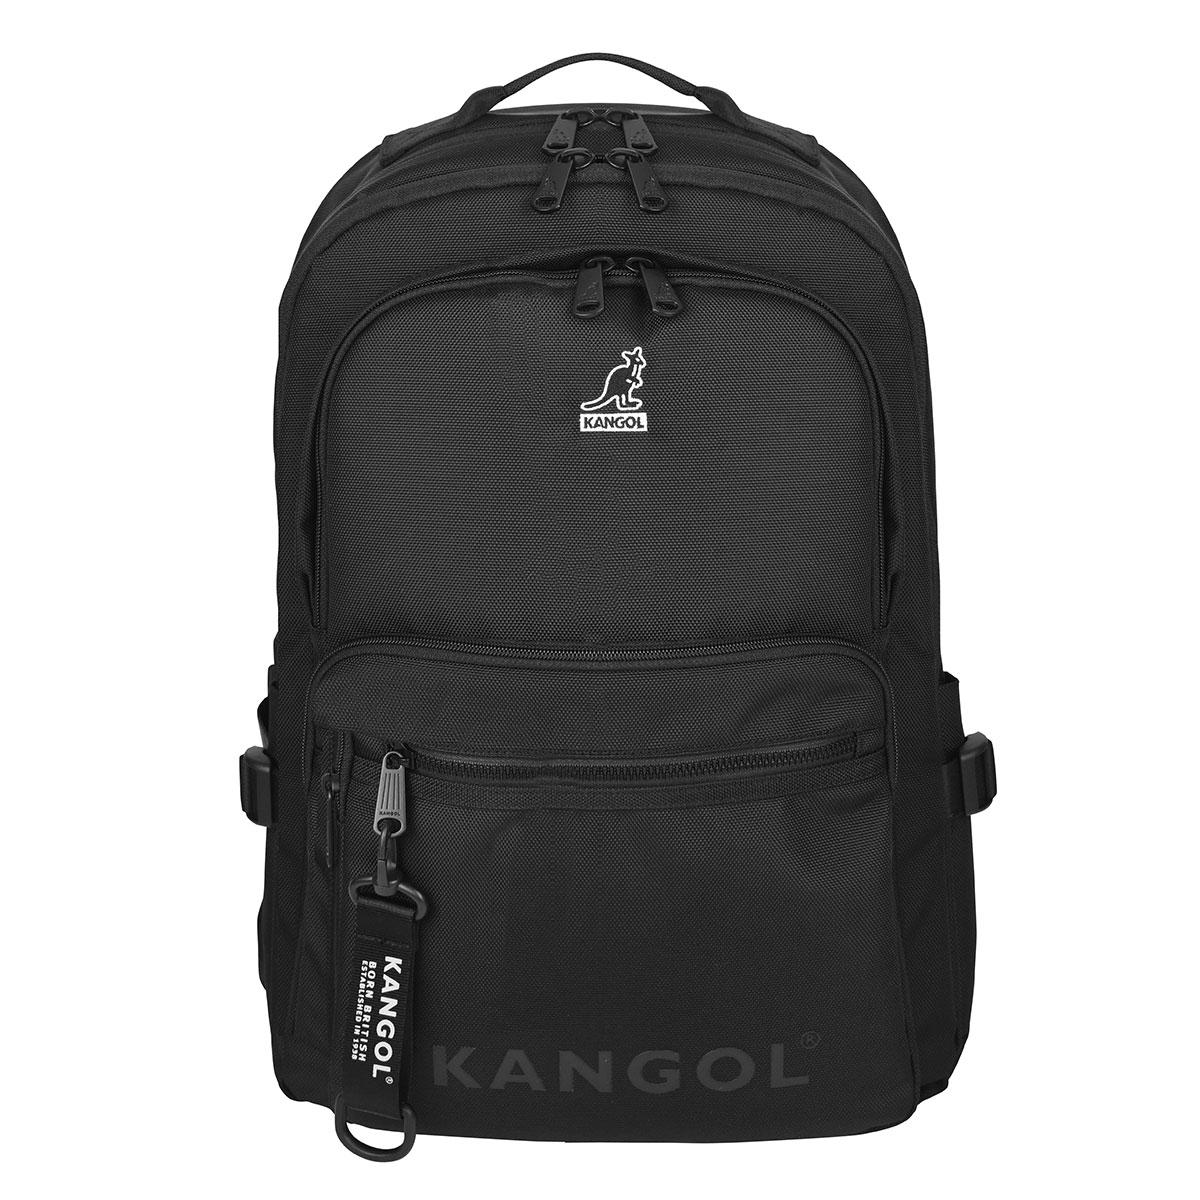 Kangol Kangol Embroidered Backpack in Black